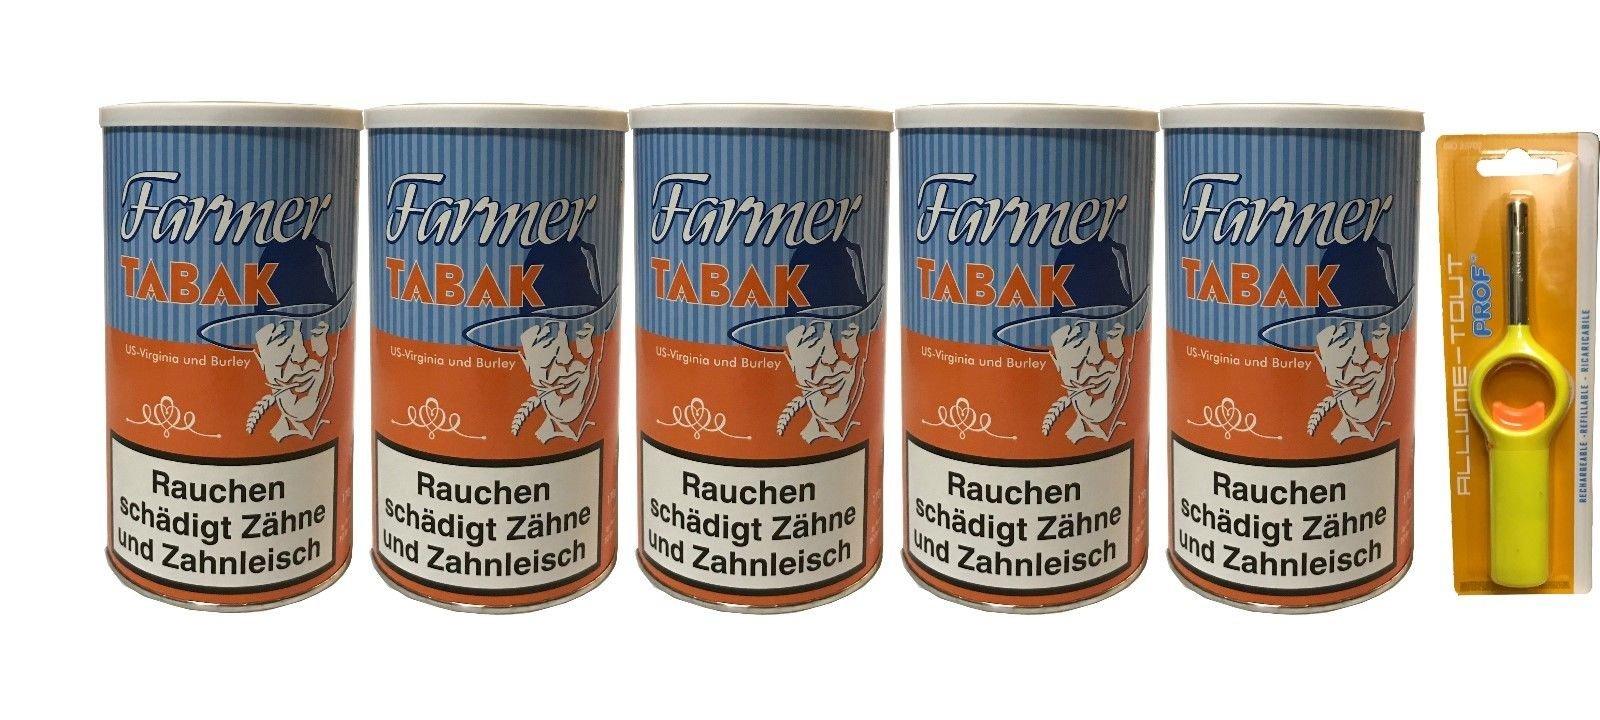 5x Dosen Farmer Tabak / Pfeifentabak á 160 g + Stabfeuerzeug